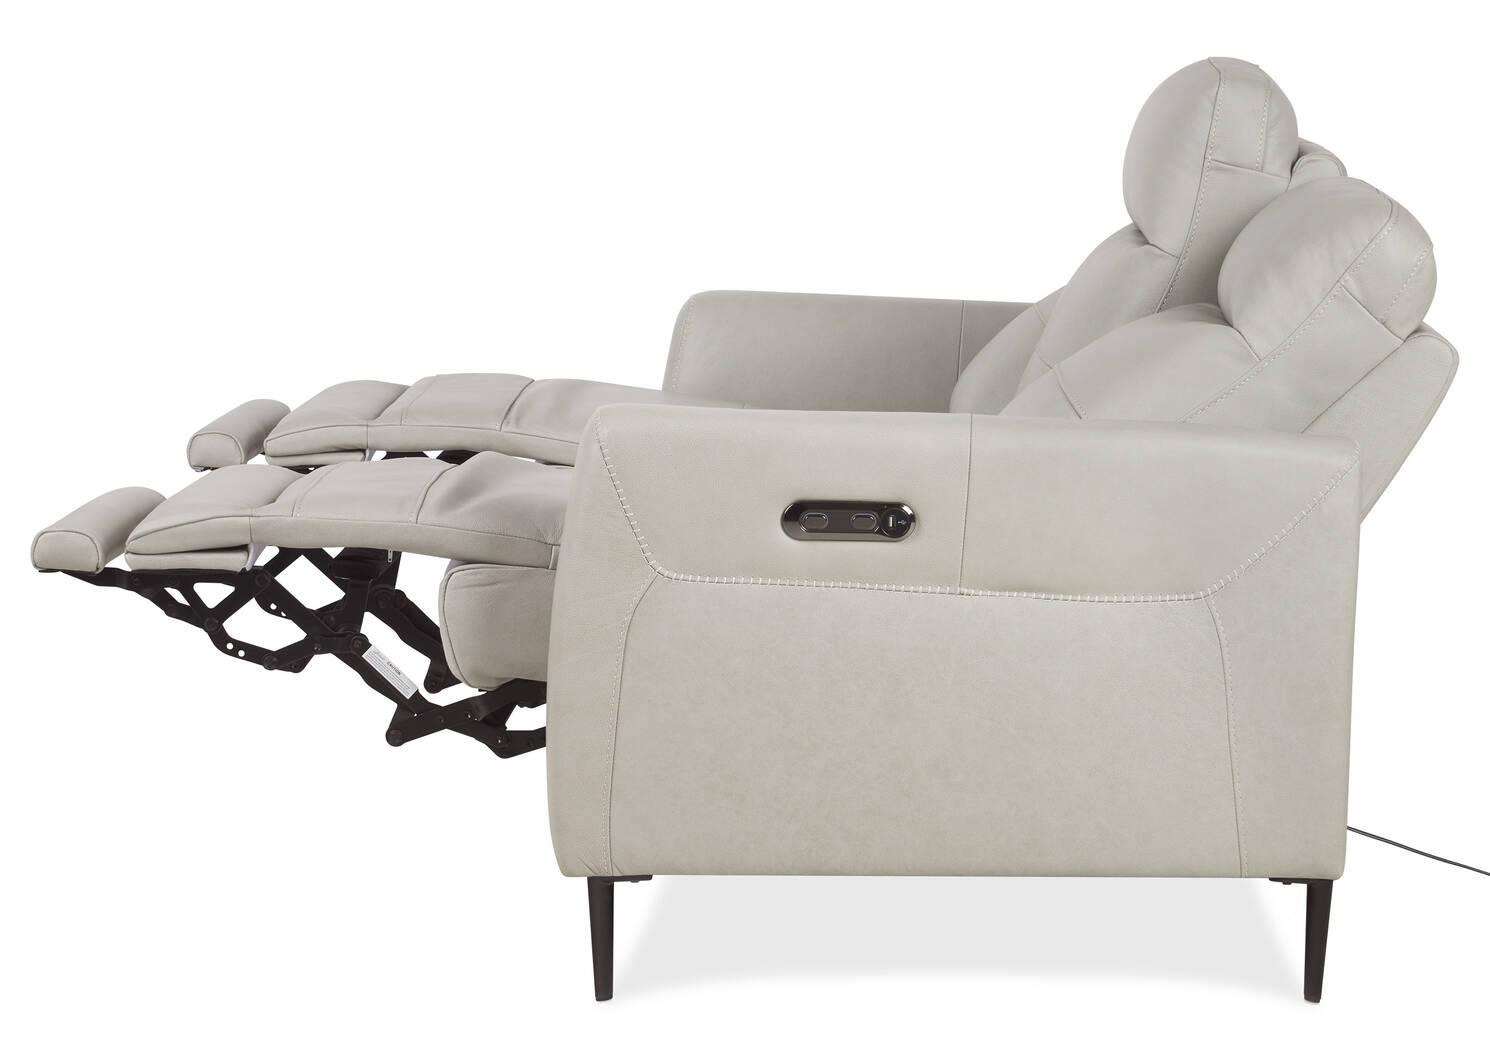 Pearson Leather Reclining Sofa -Ashby Do